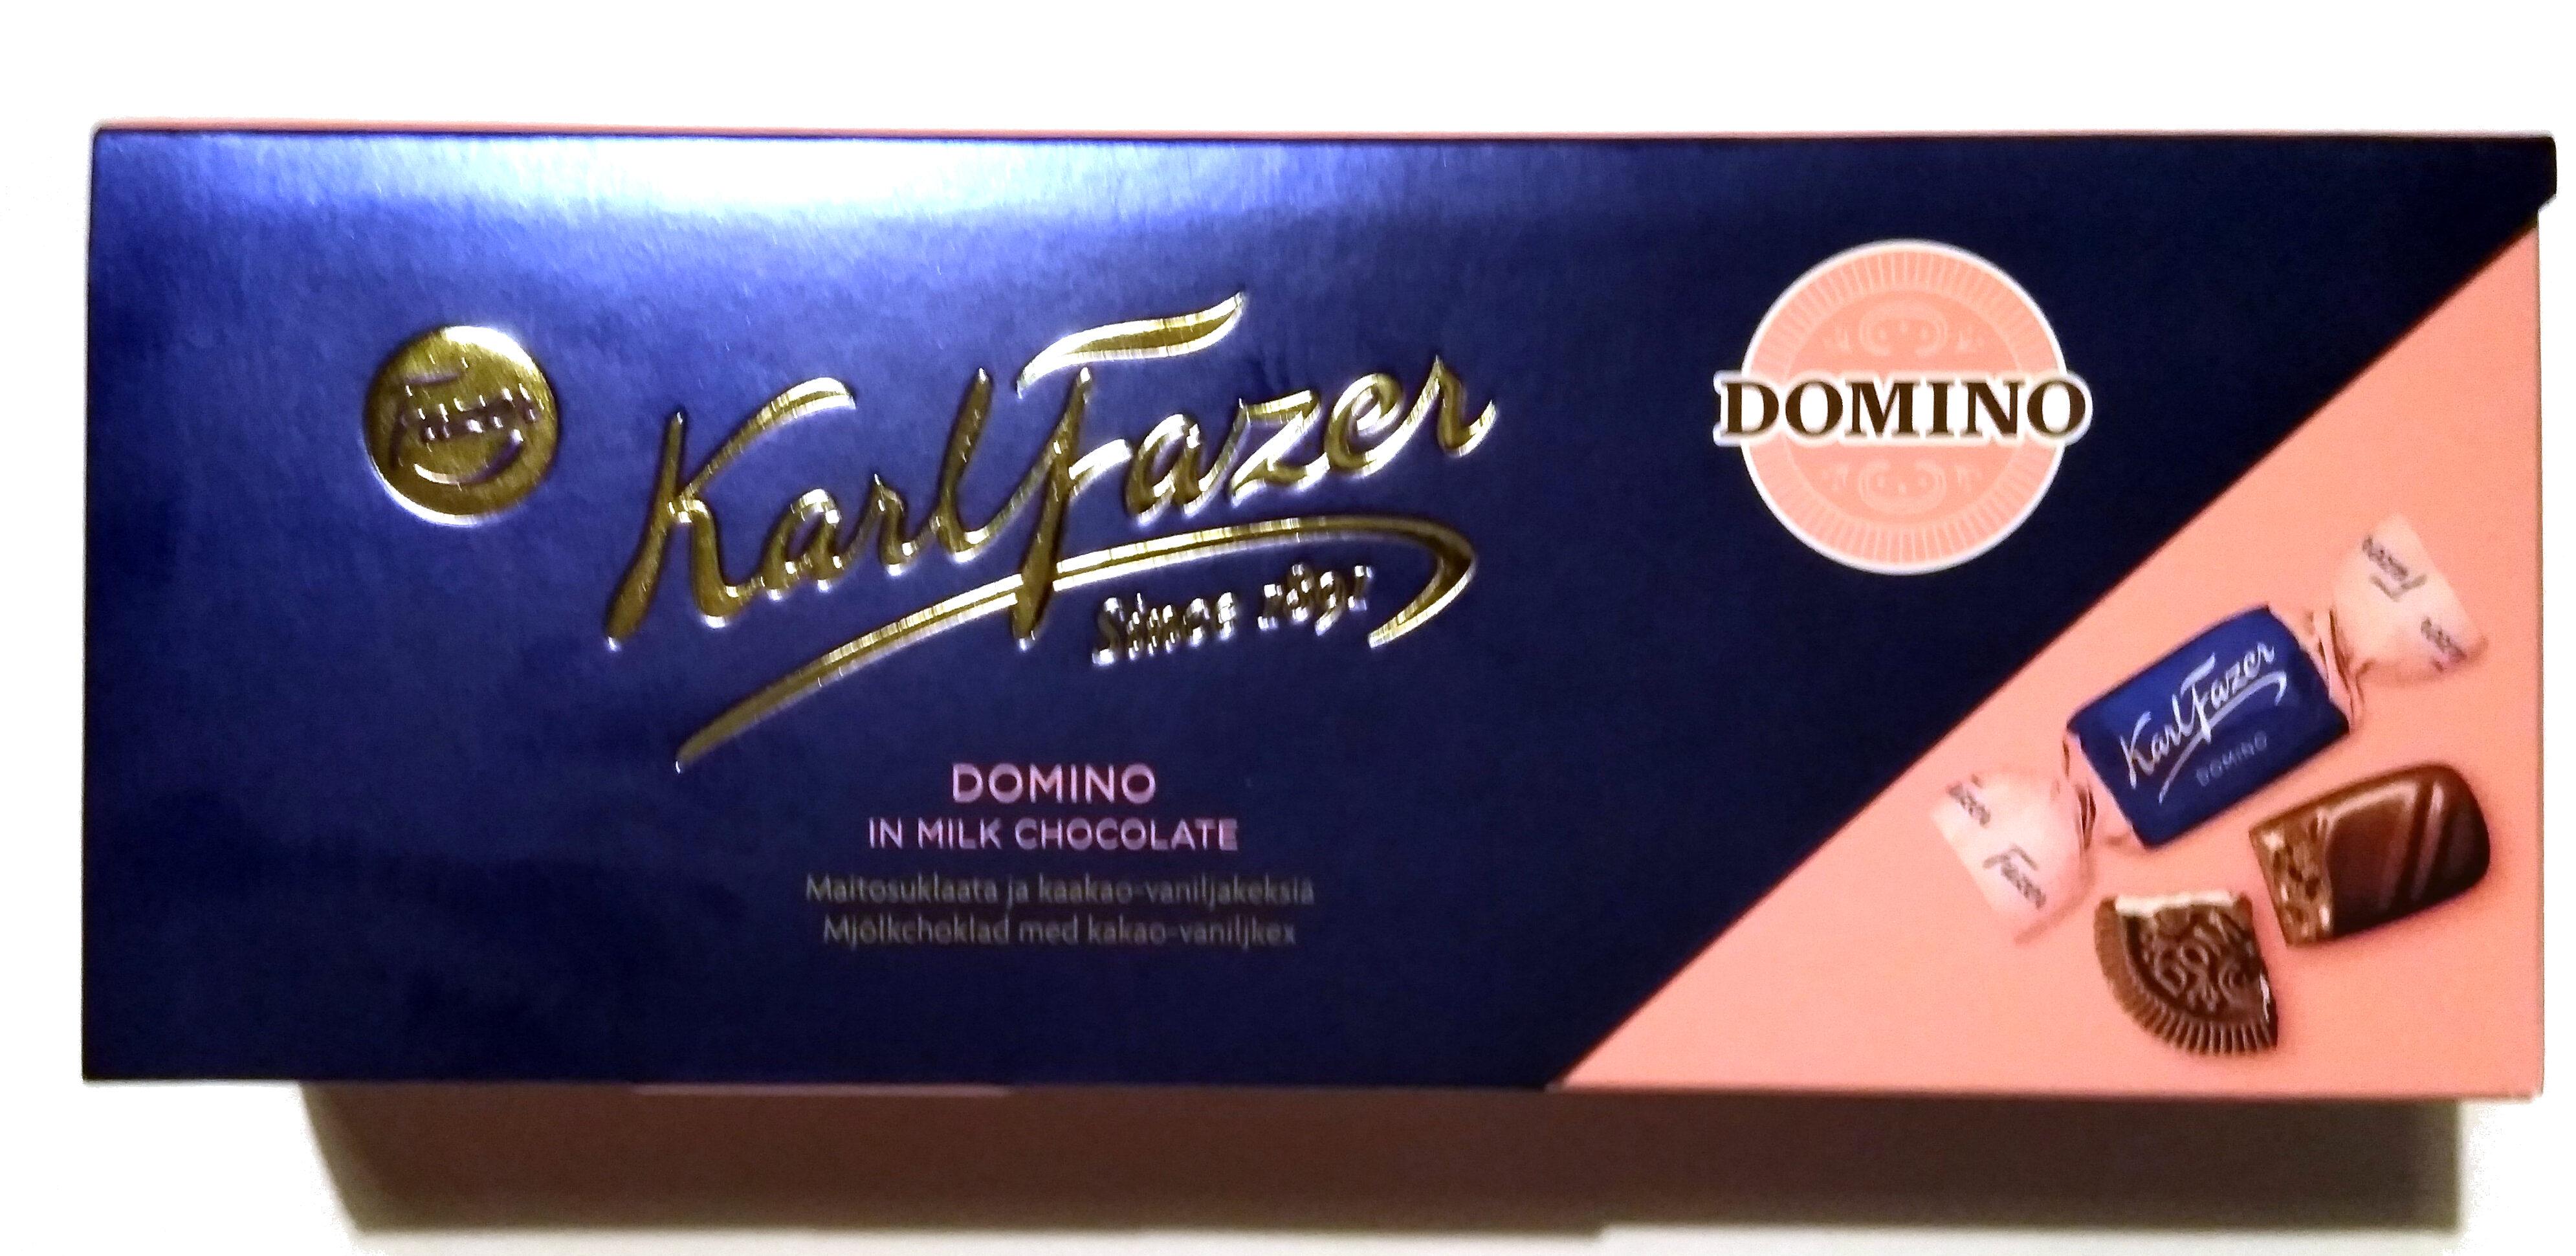 Karl Fazer Domino - Product - en